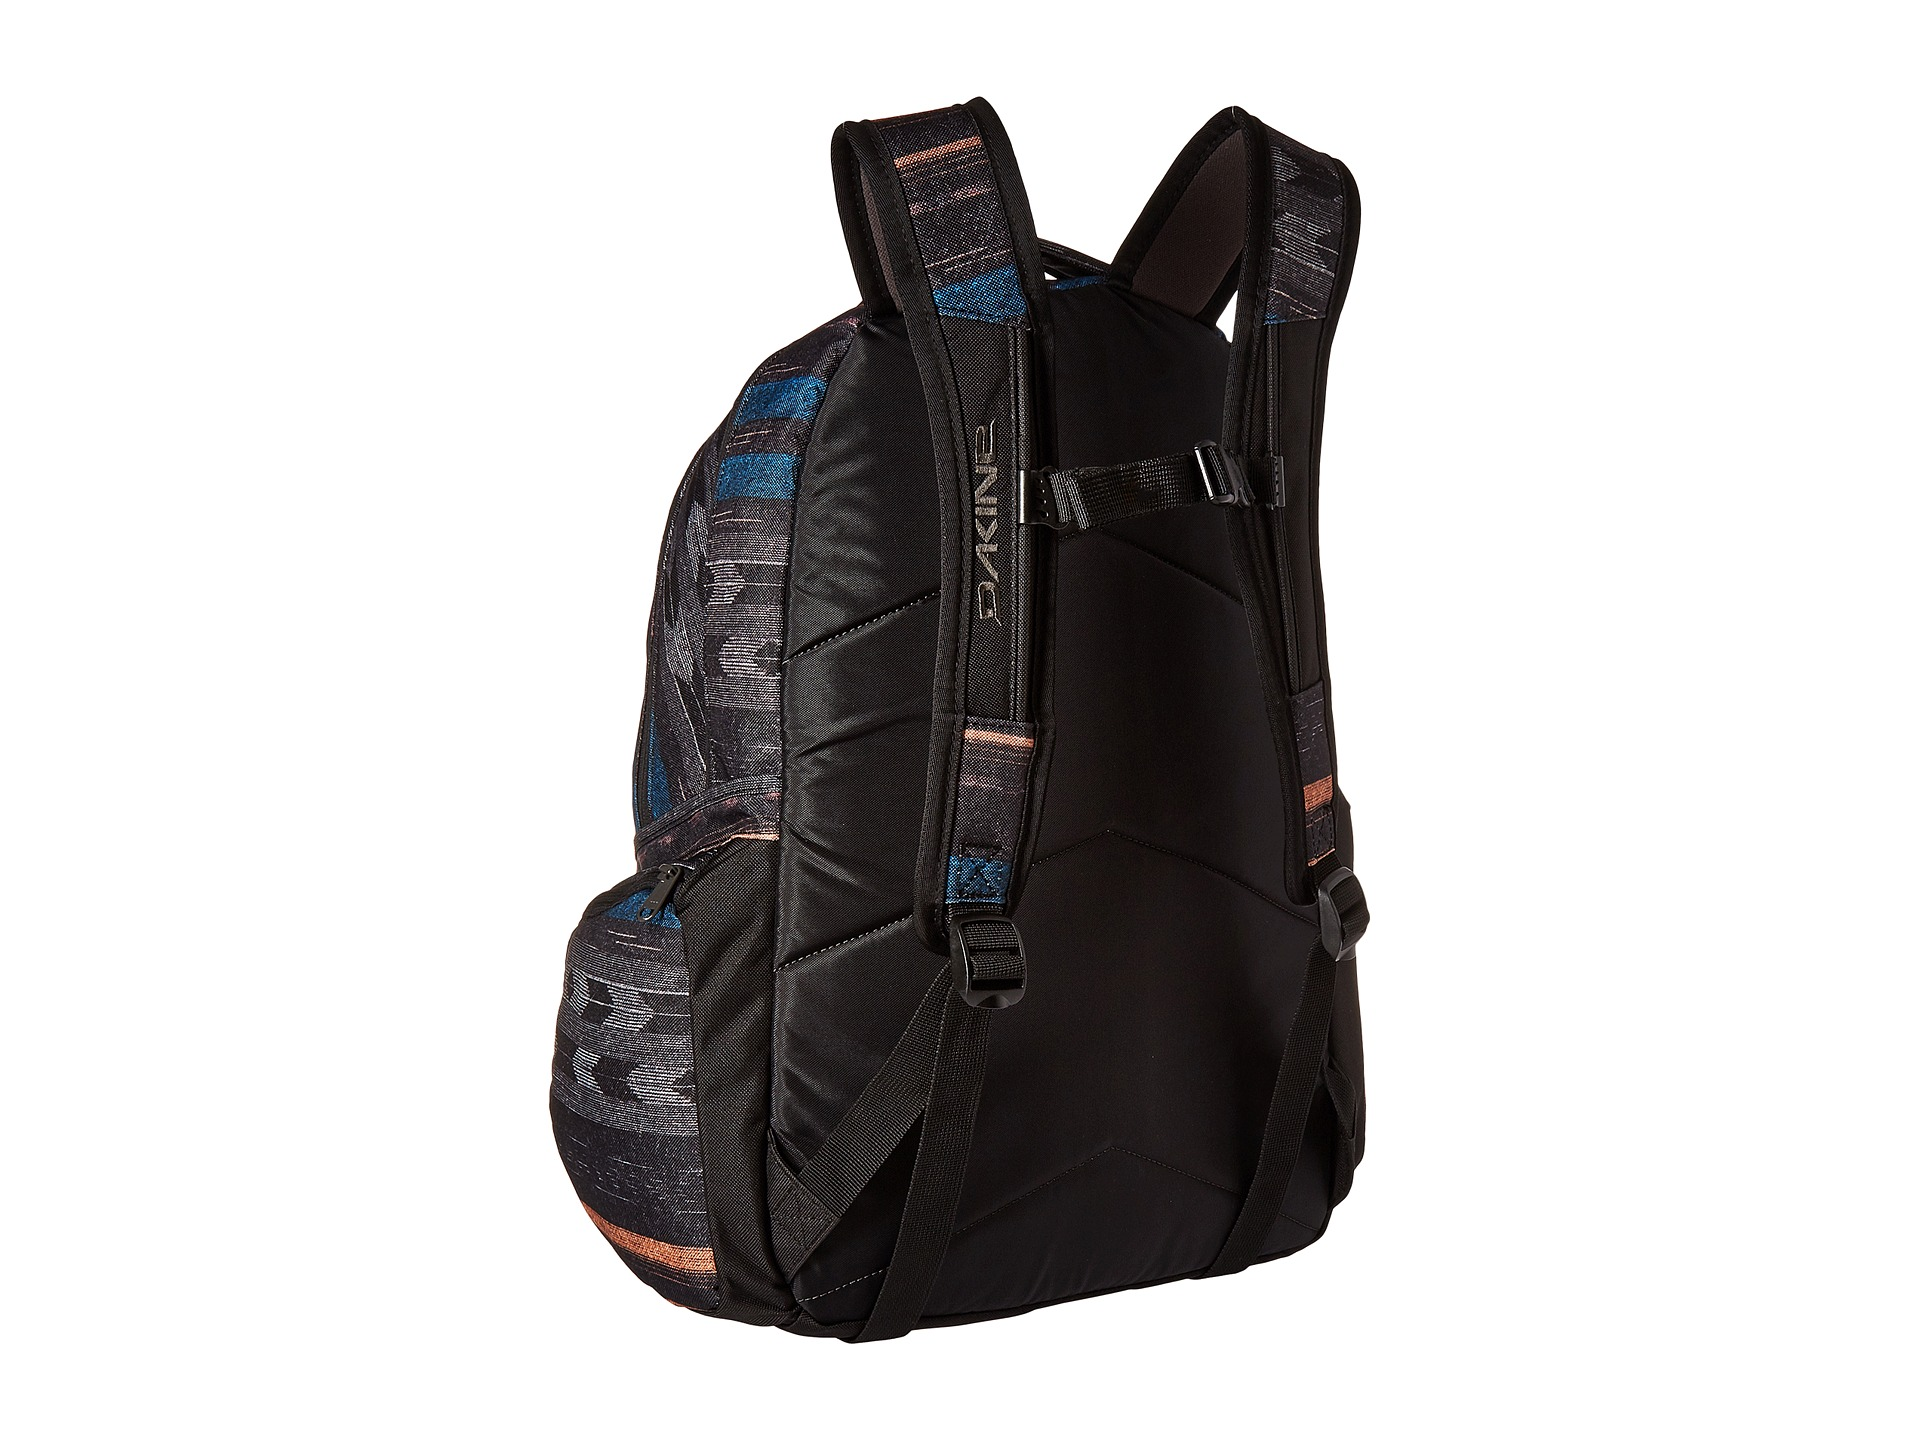 Dakine Otis Backpack 30L Inversion Zapposcom Free